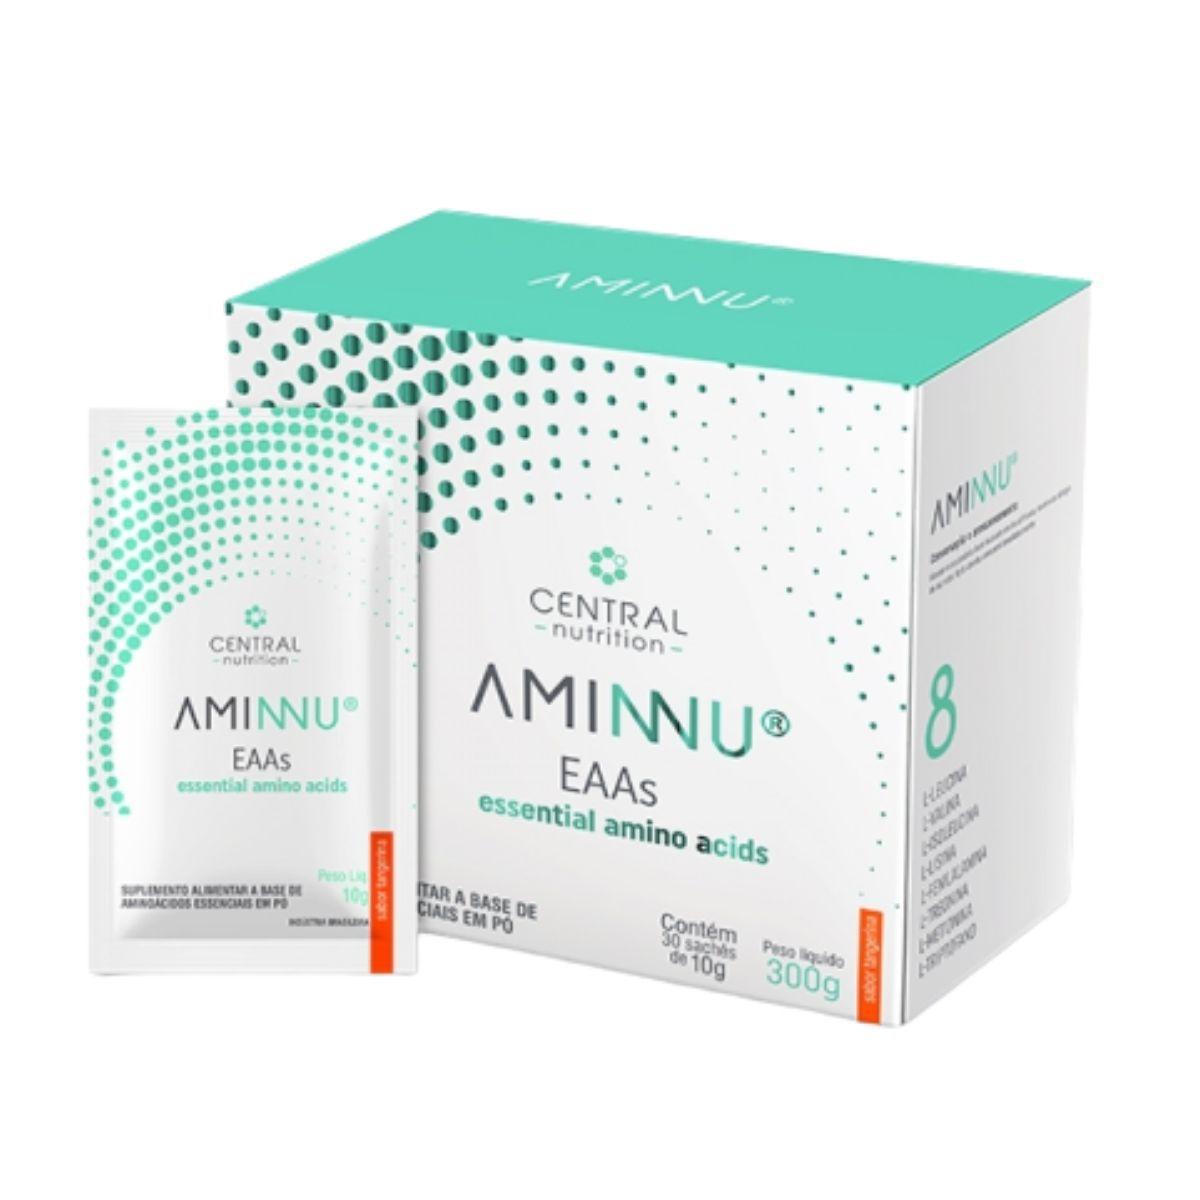 Aminnu Tangerina 30 Sachês EAAs 10g - Suplemento Alimentar A Base De Aminoácidos Essenciais - Central Nutrition